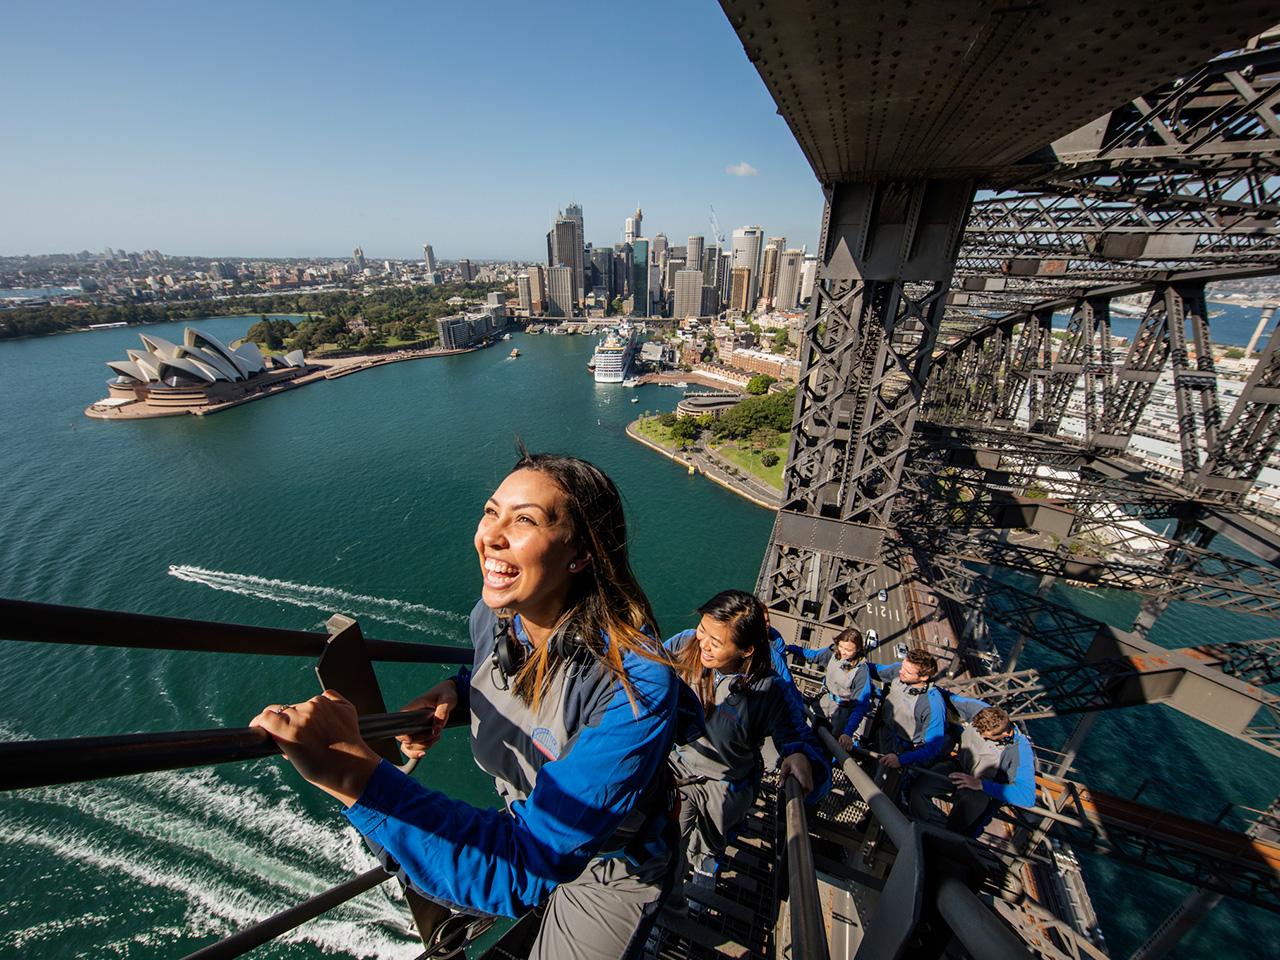 5 Reasons the Sydney BridgeClimb Is a Must-Do